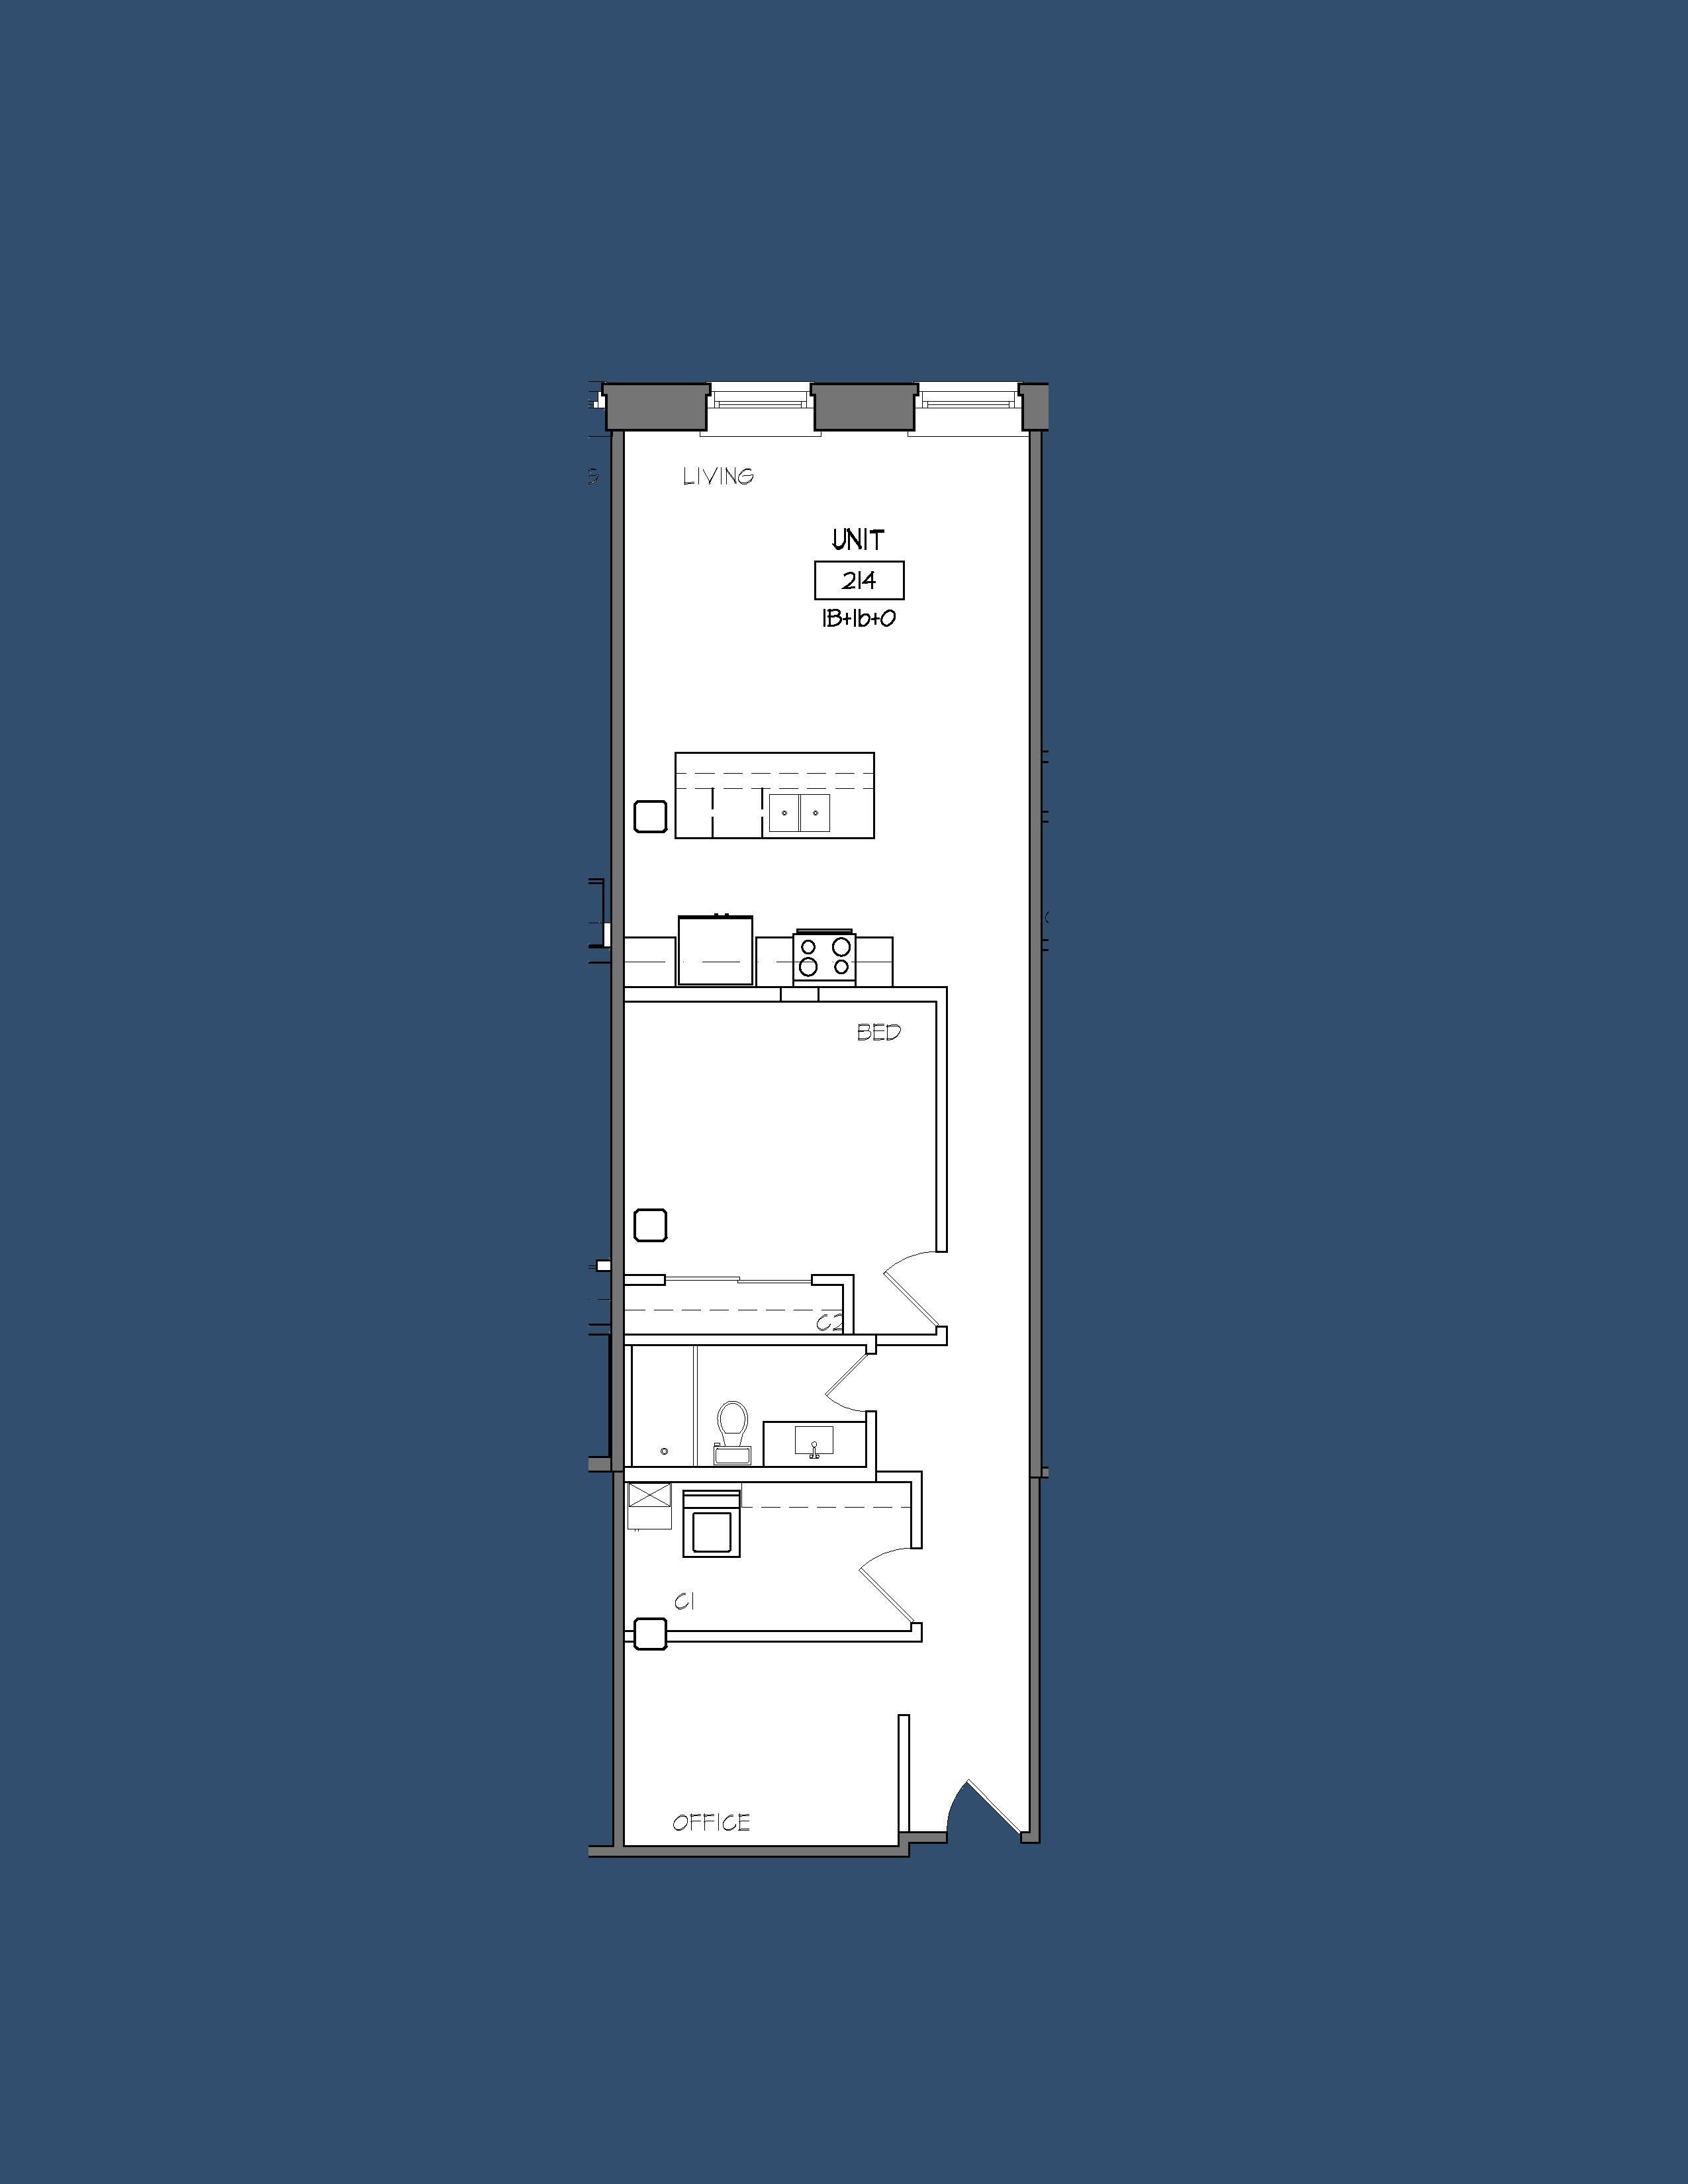 Unit 214 Floor Plan